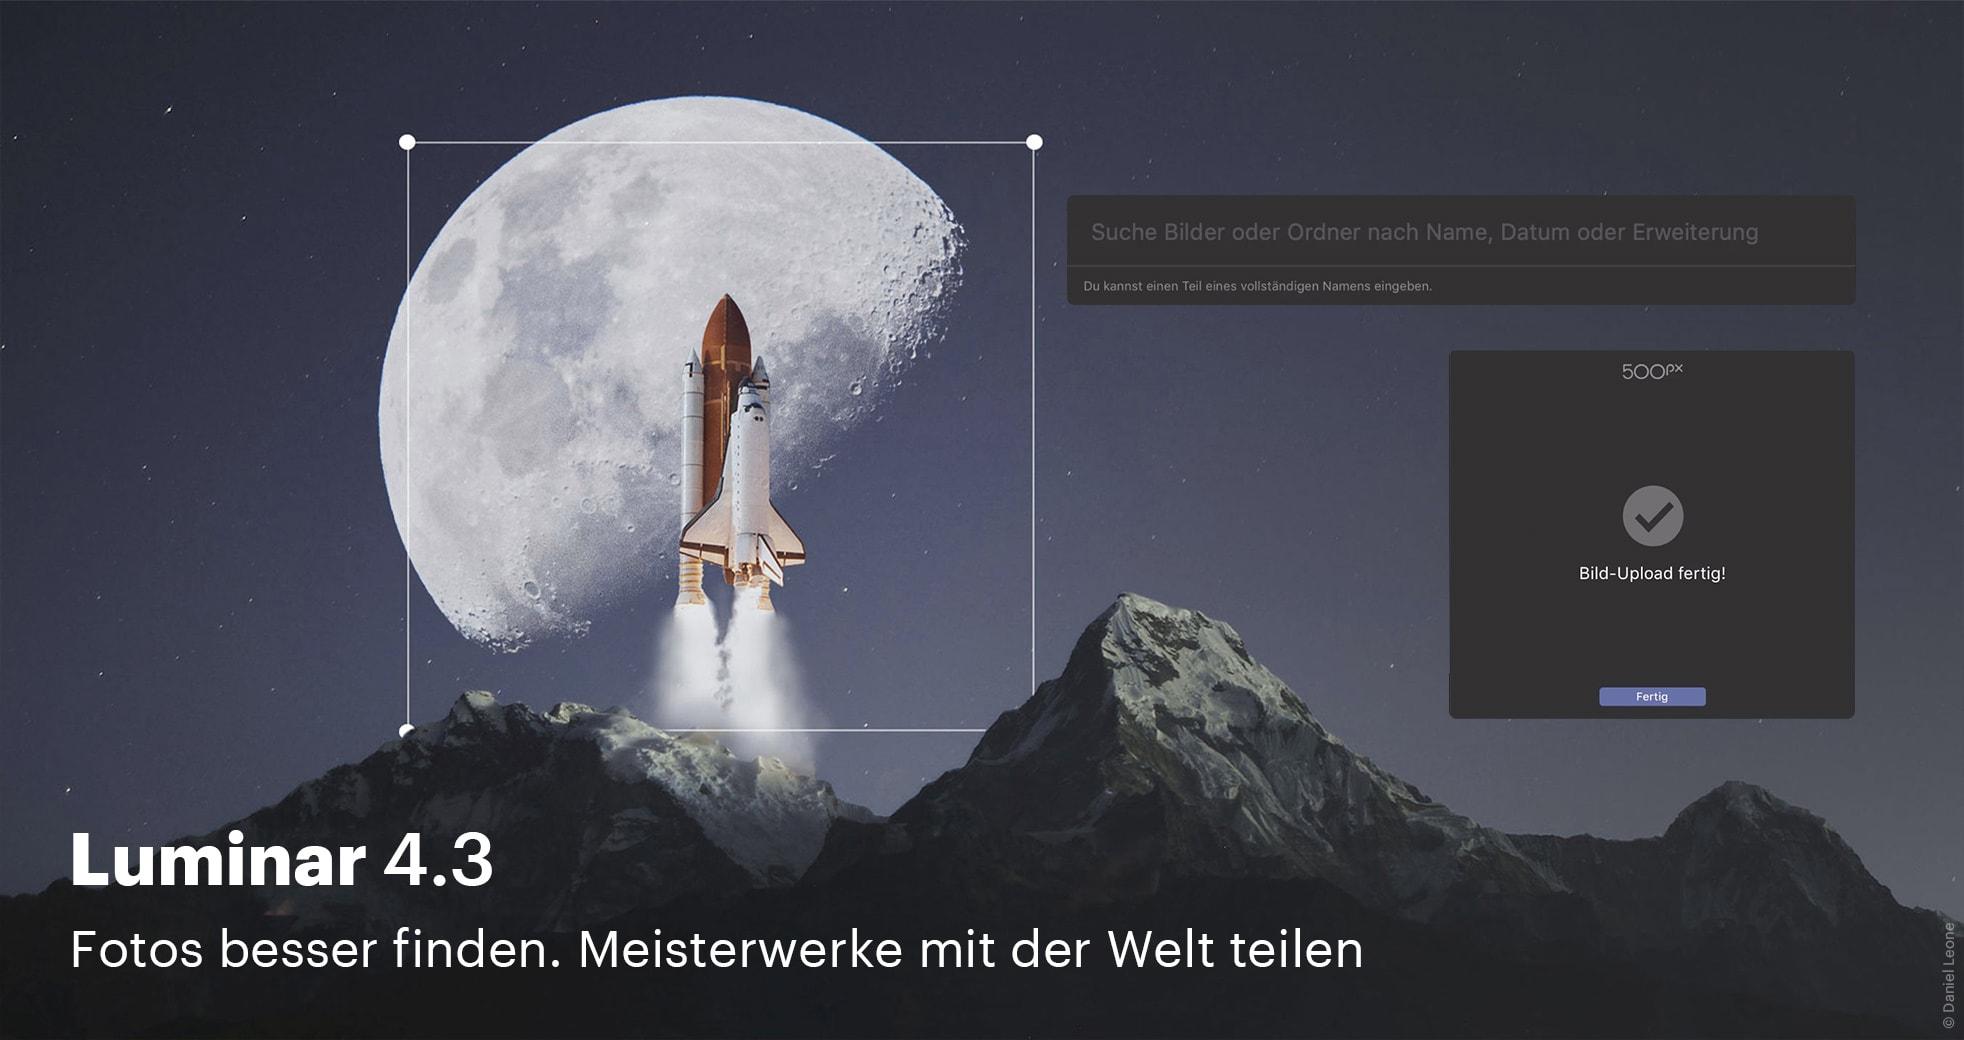 Luminar Update 4.3 - Spaceshuttle